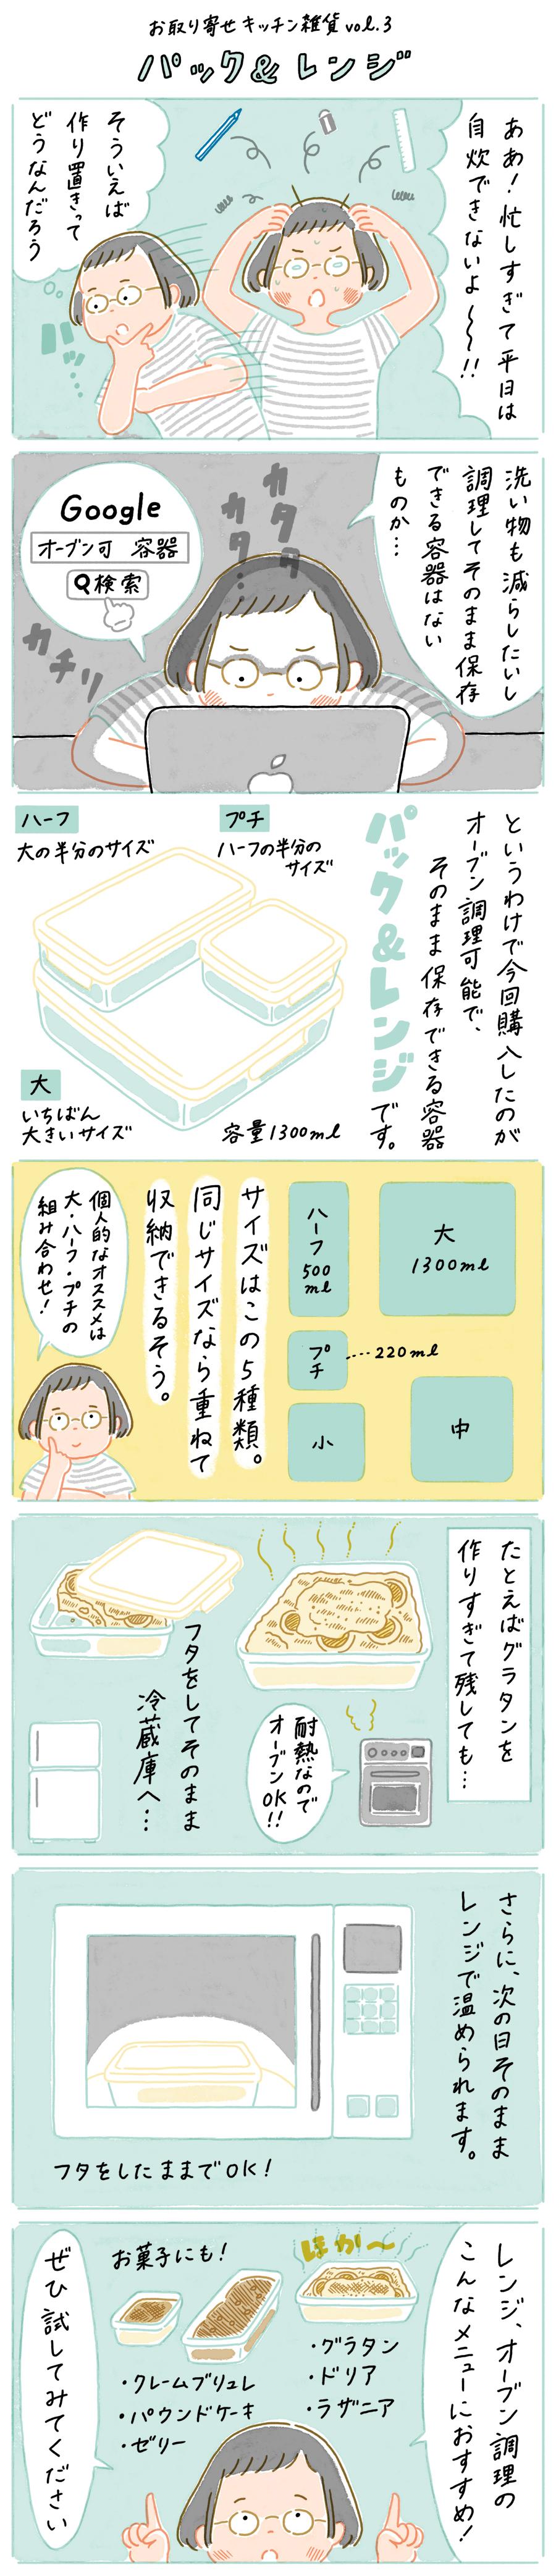 report004-2